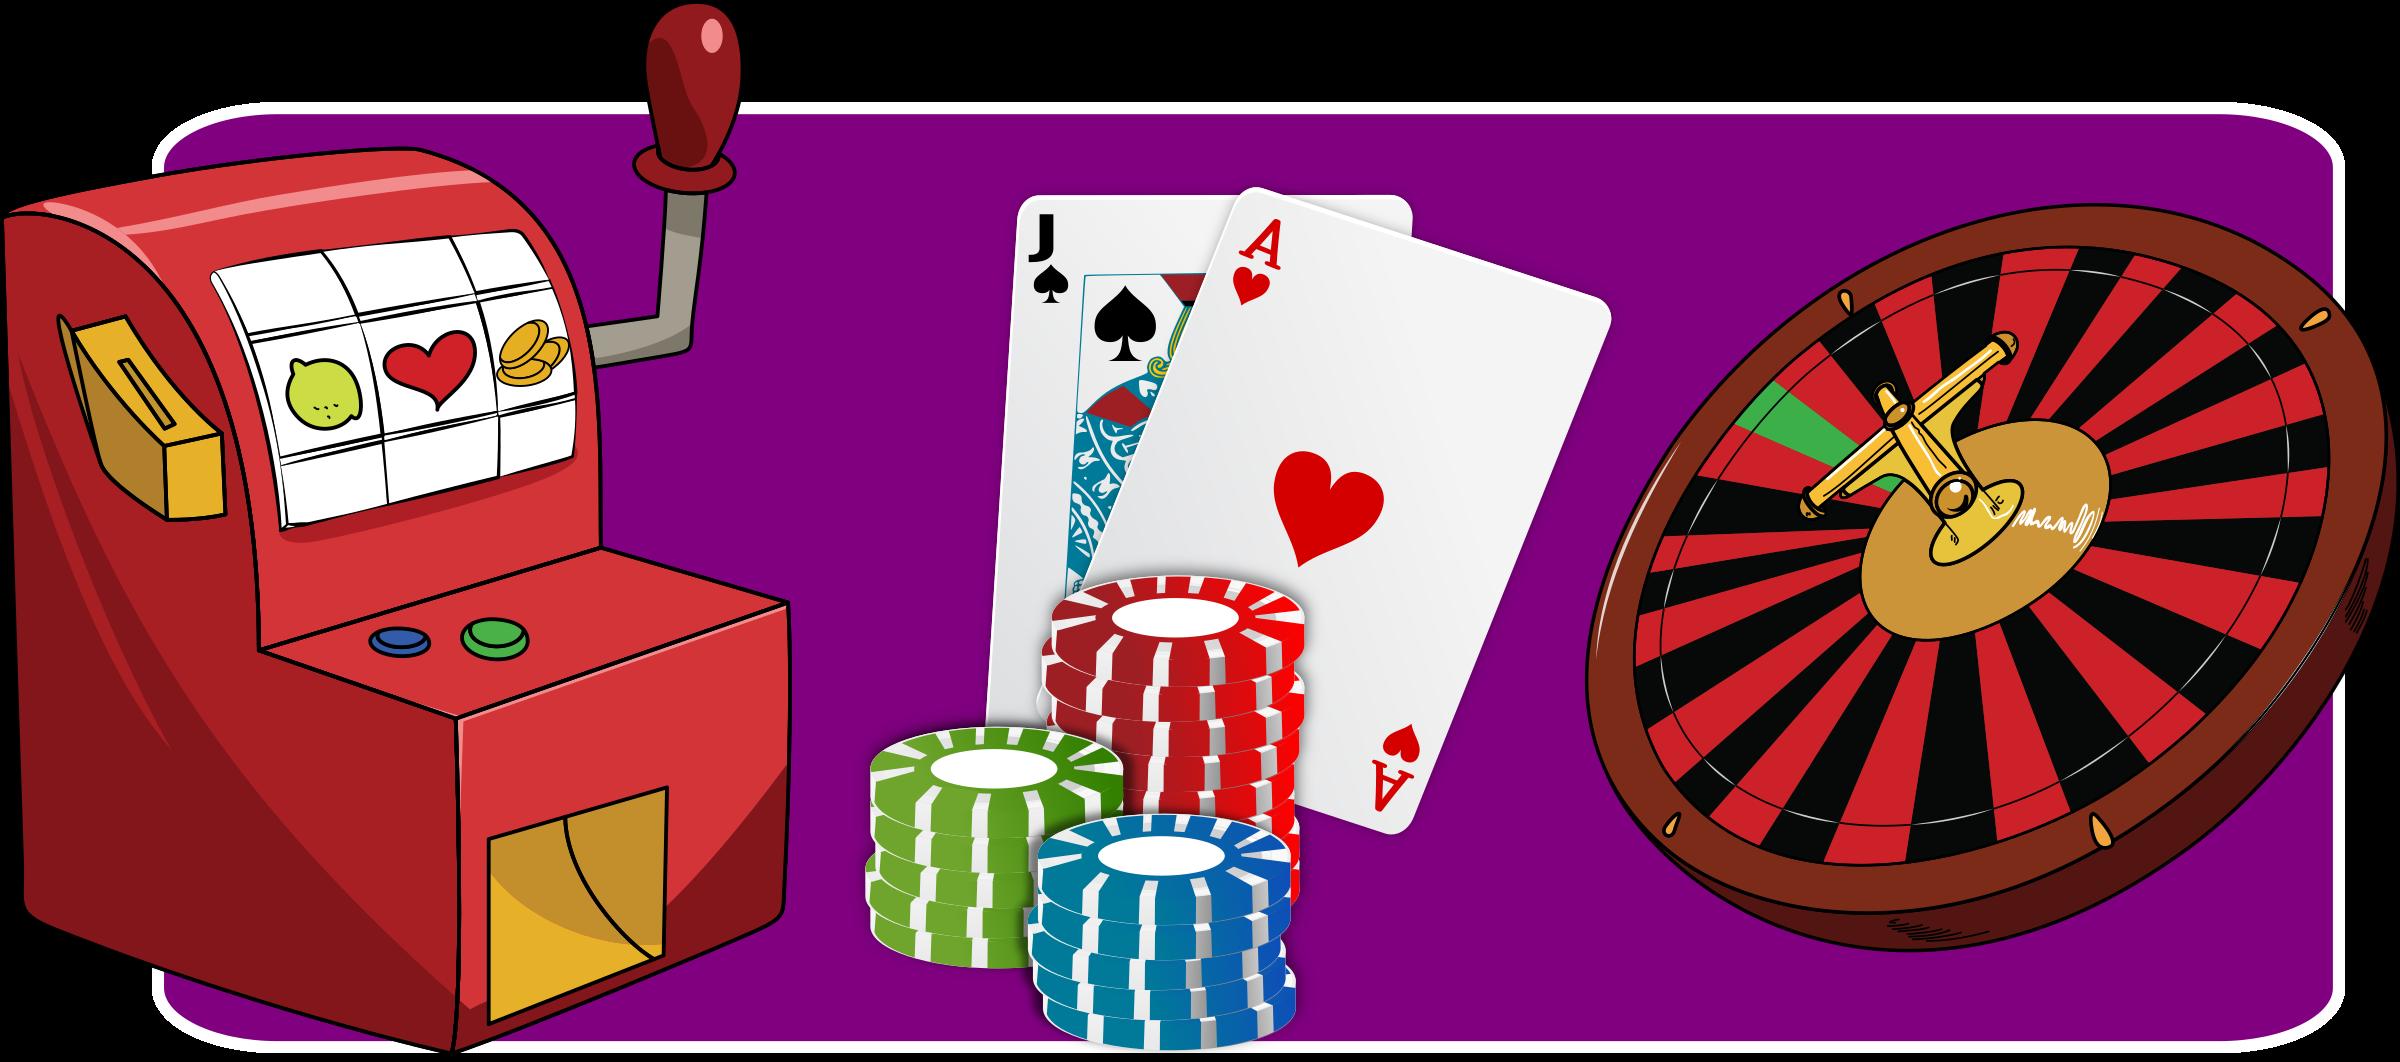 Gambling icons png free. Holidays clipart casino